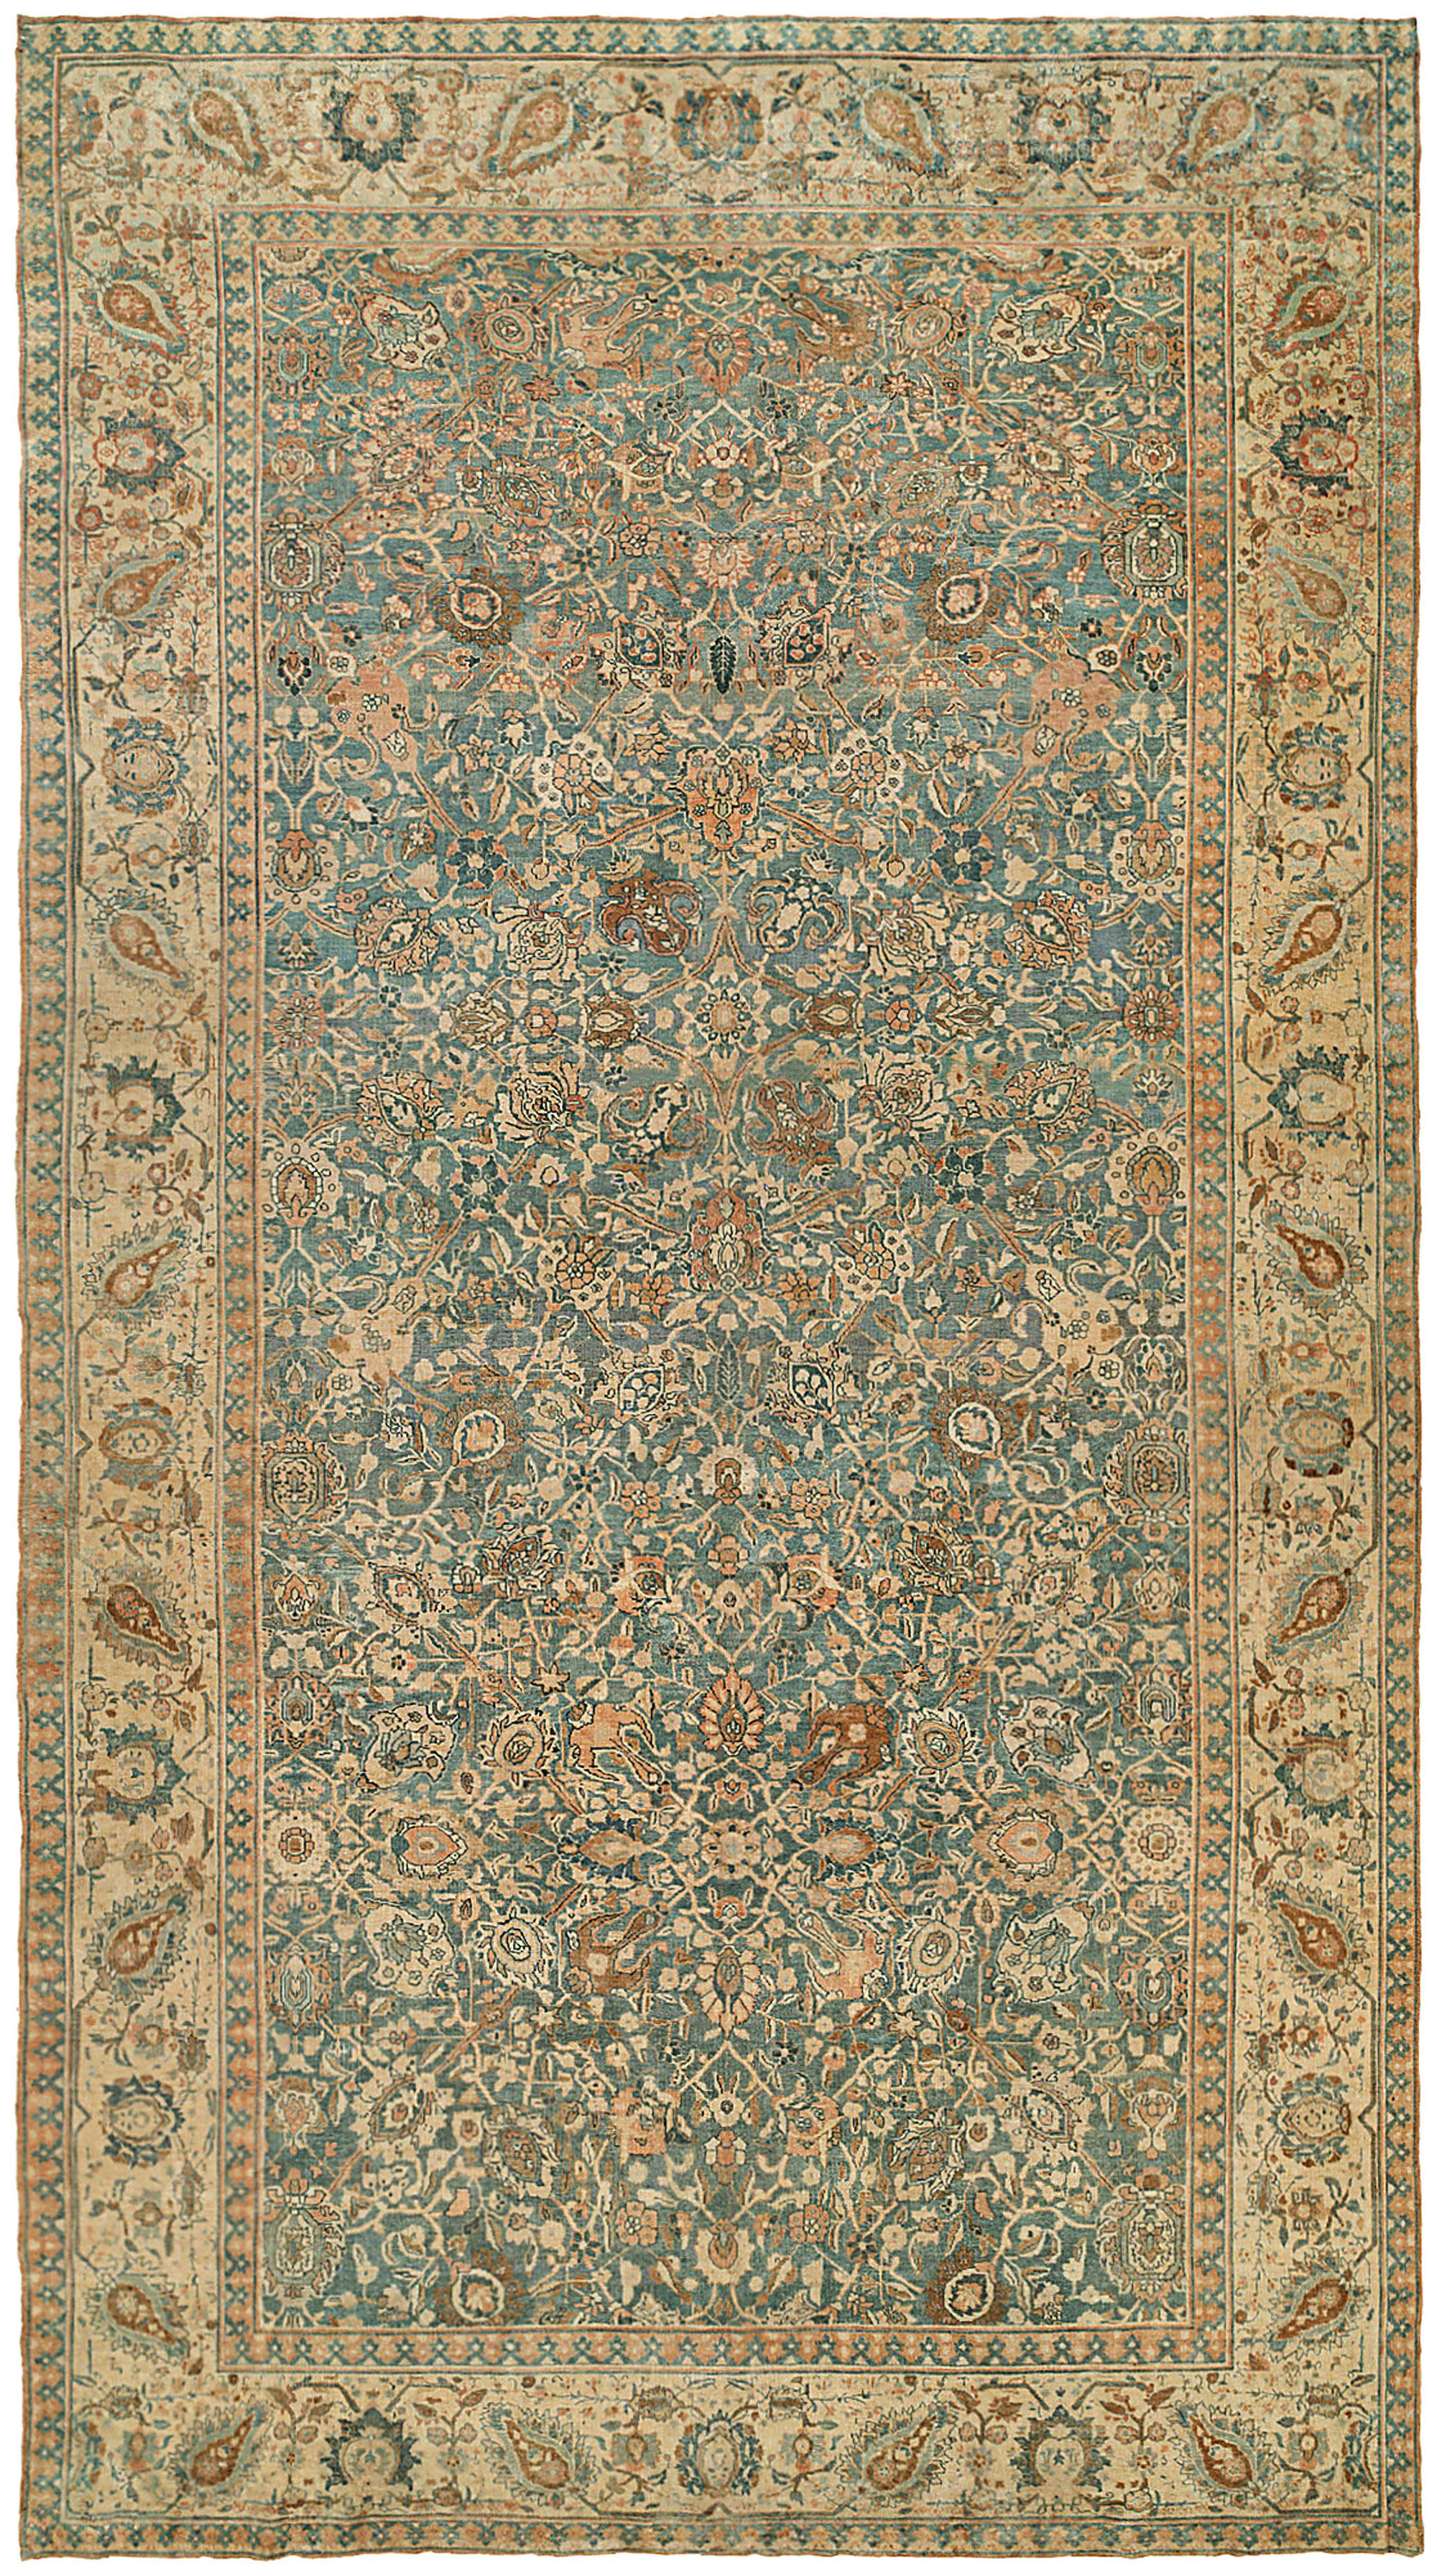 Antique Persian Tabriz Rug Bb2187 By Dlb